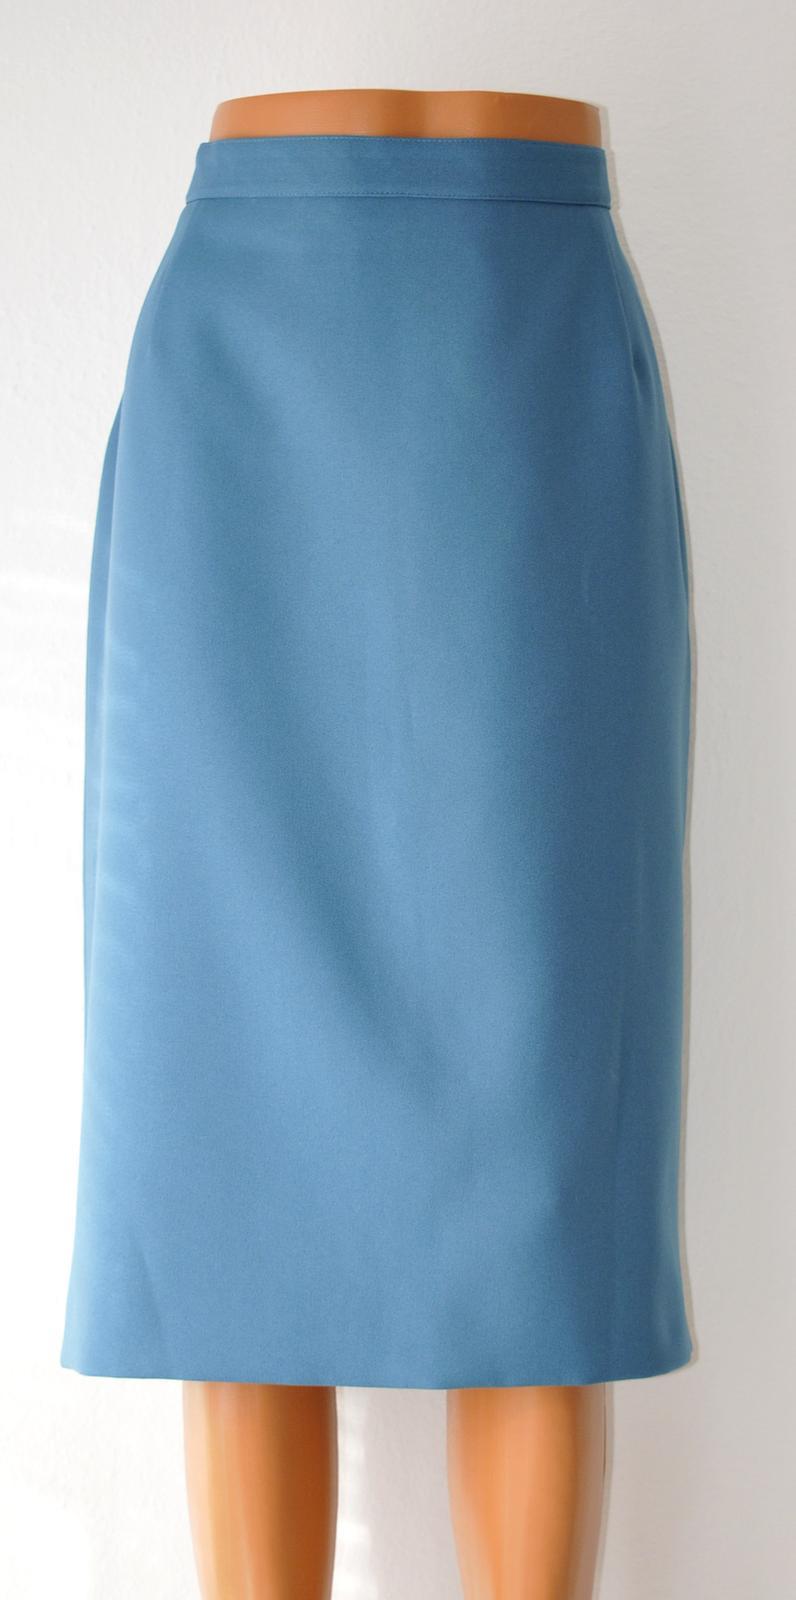 Dámsky kostým - sáčko + sukňa /podšité/ - Obrázok č. 2